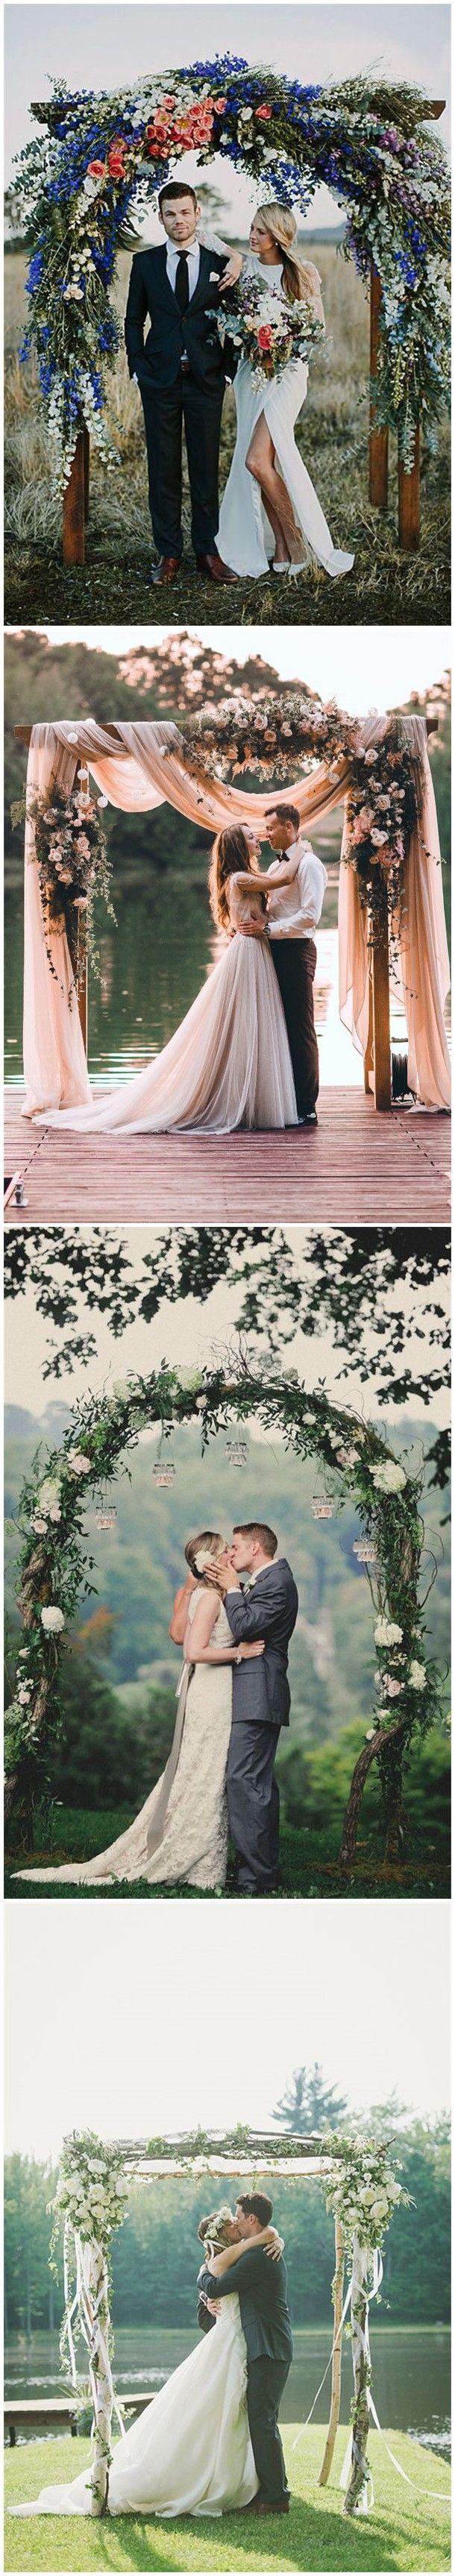 20 diy floral wedding arch decoration ideas casamento decorao 20 diy floral wedding arch decoration ideas junglespirit Images